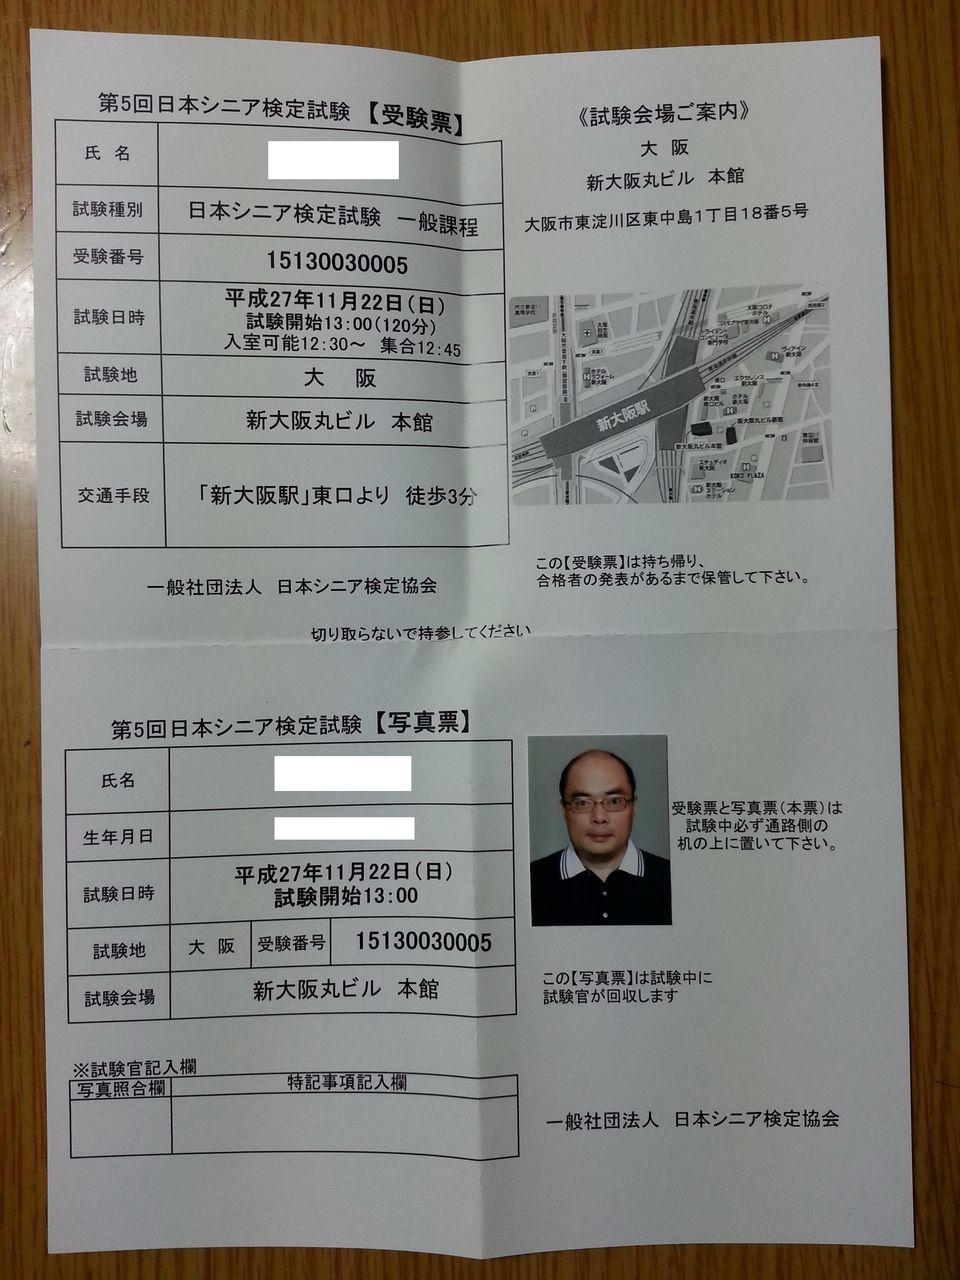 日本シニア検定試験 一般課程受...